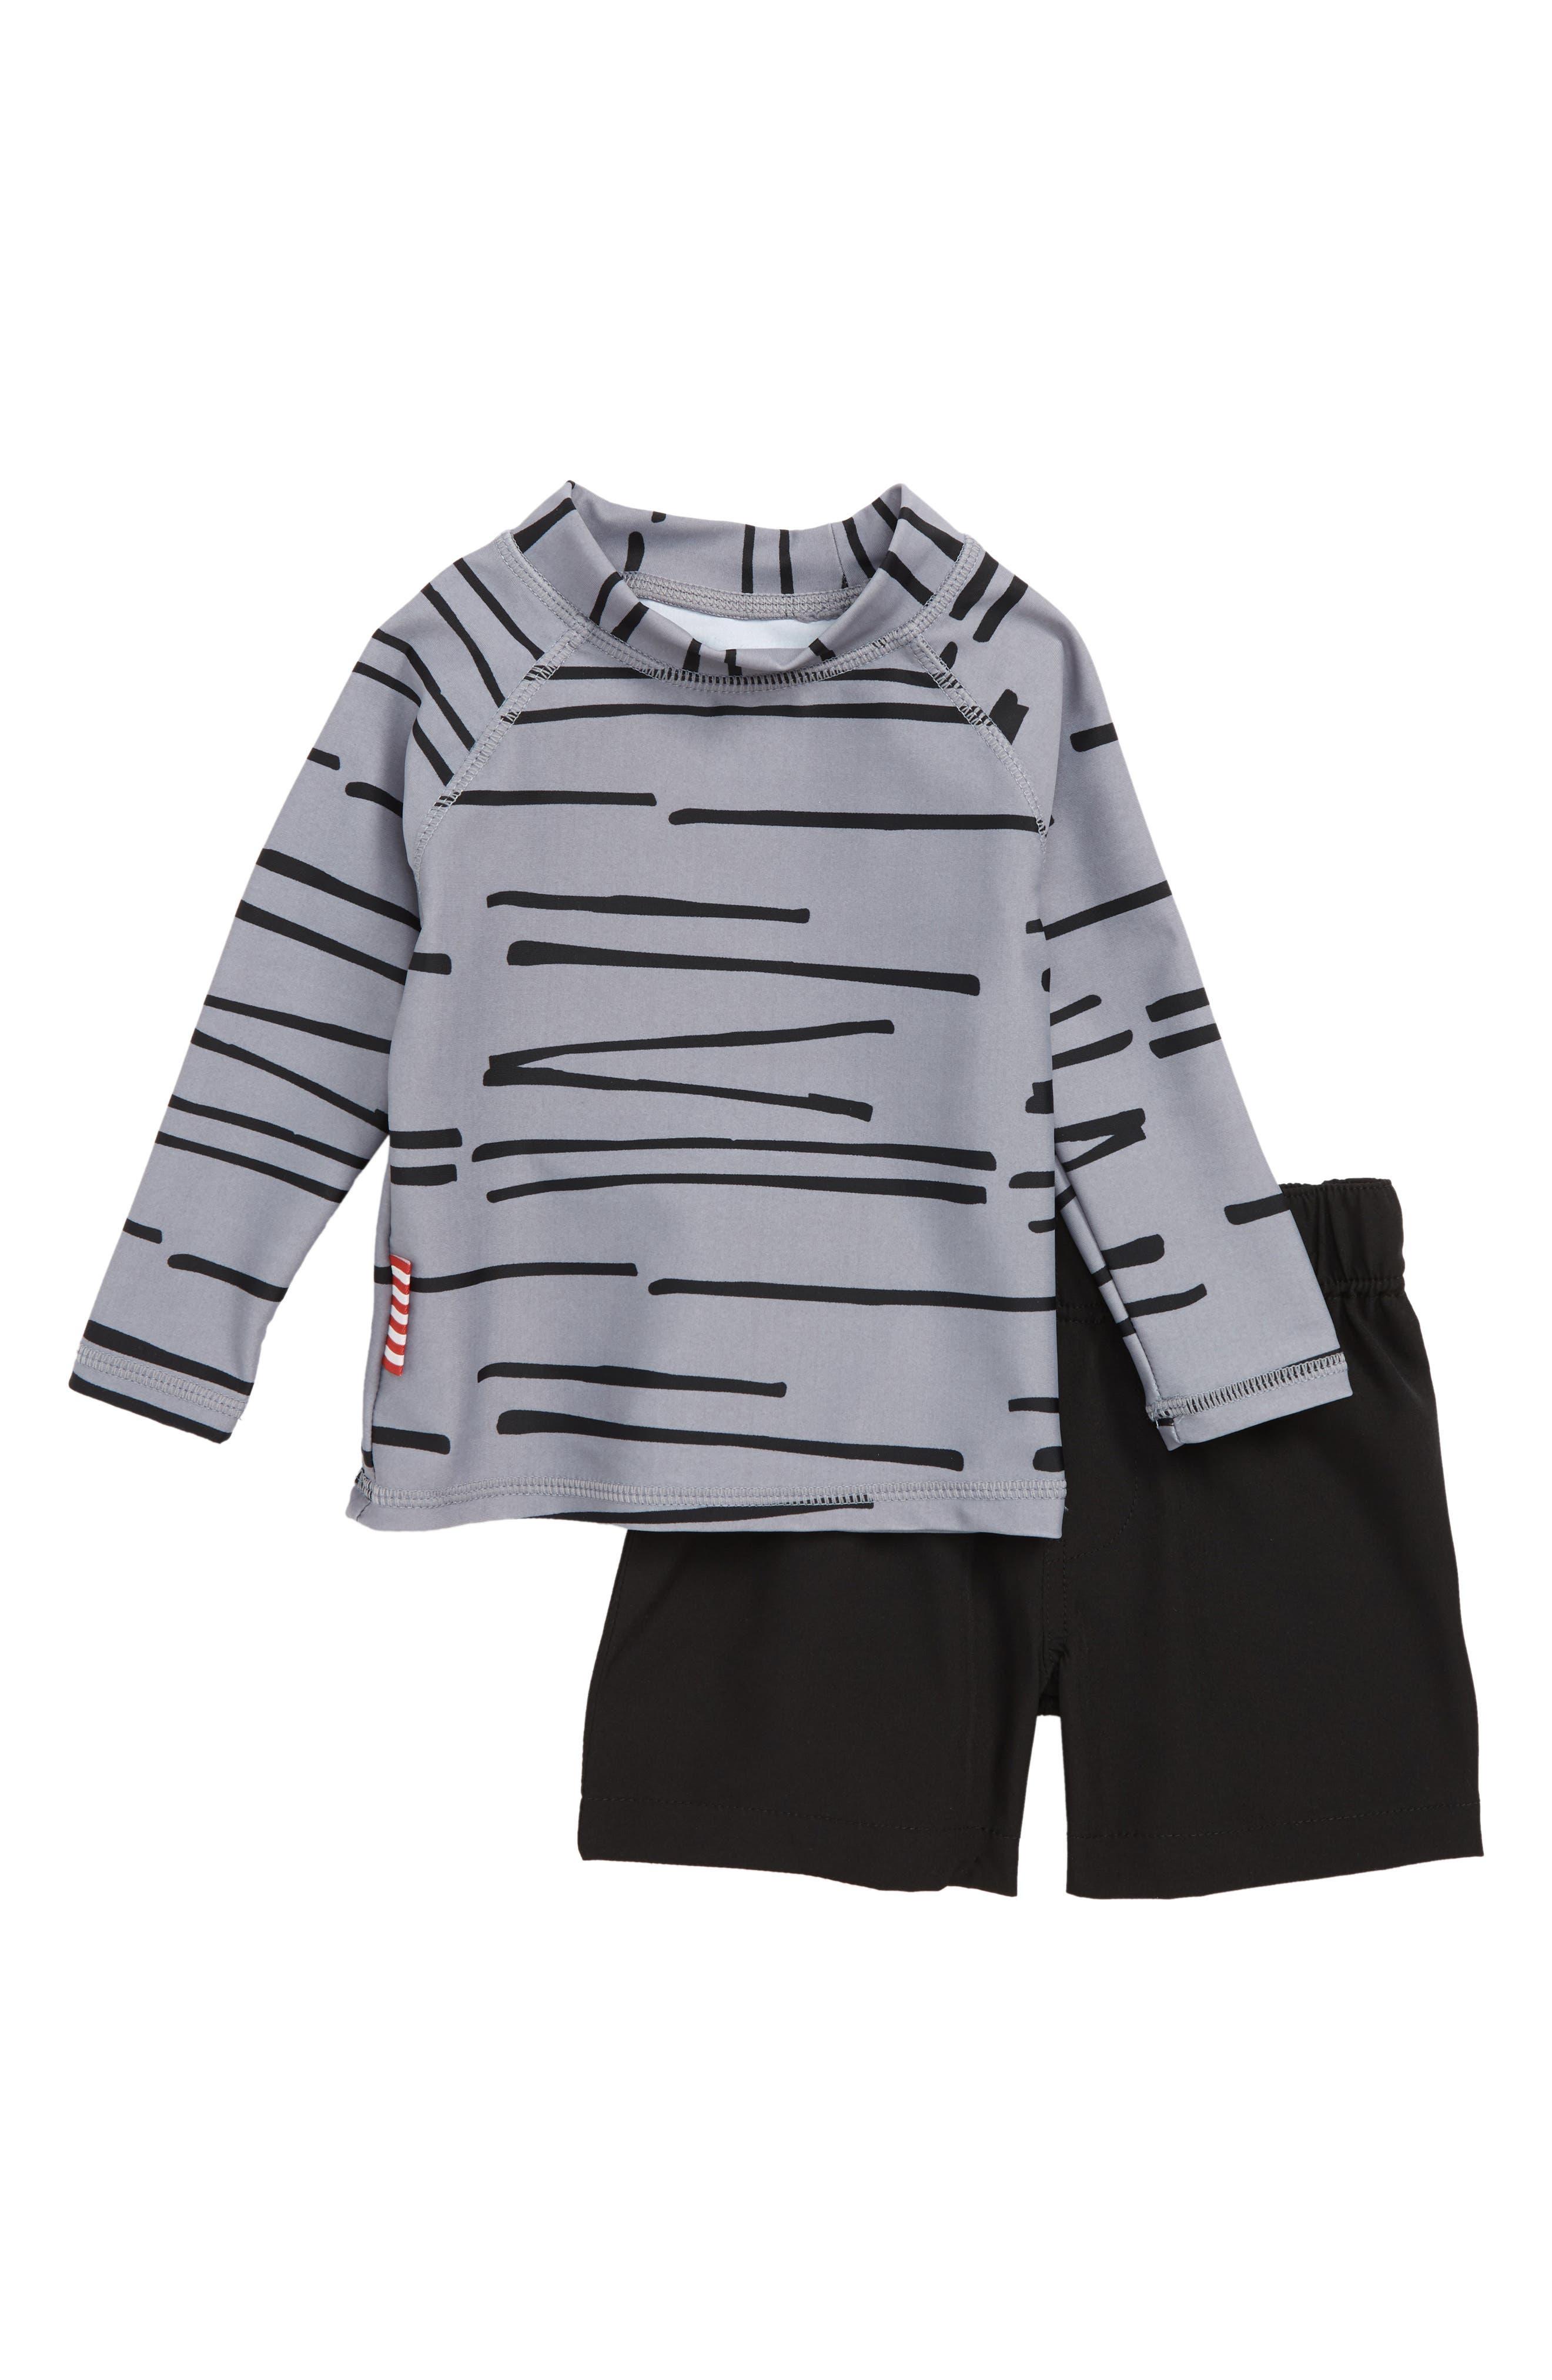 Tiger Stripe Rashguard & Board Shorts Set,                         Main,                         color, Multi